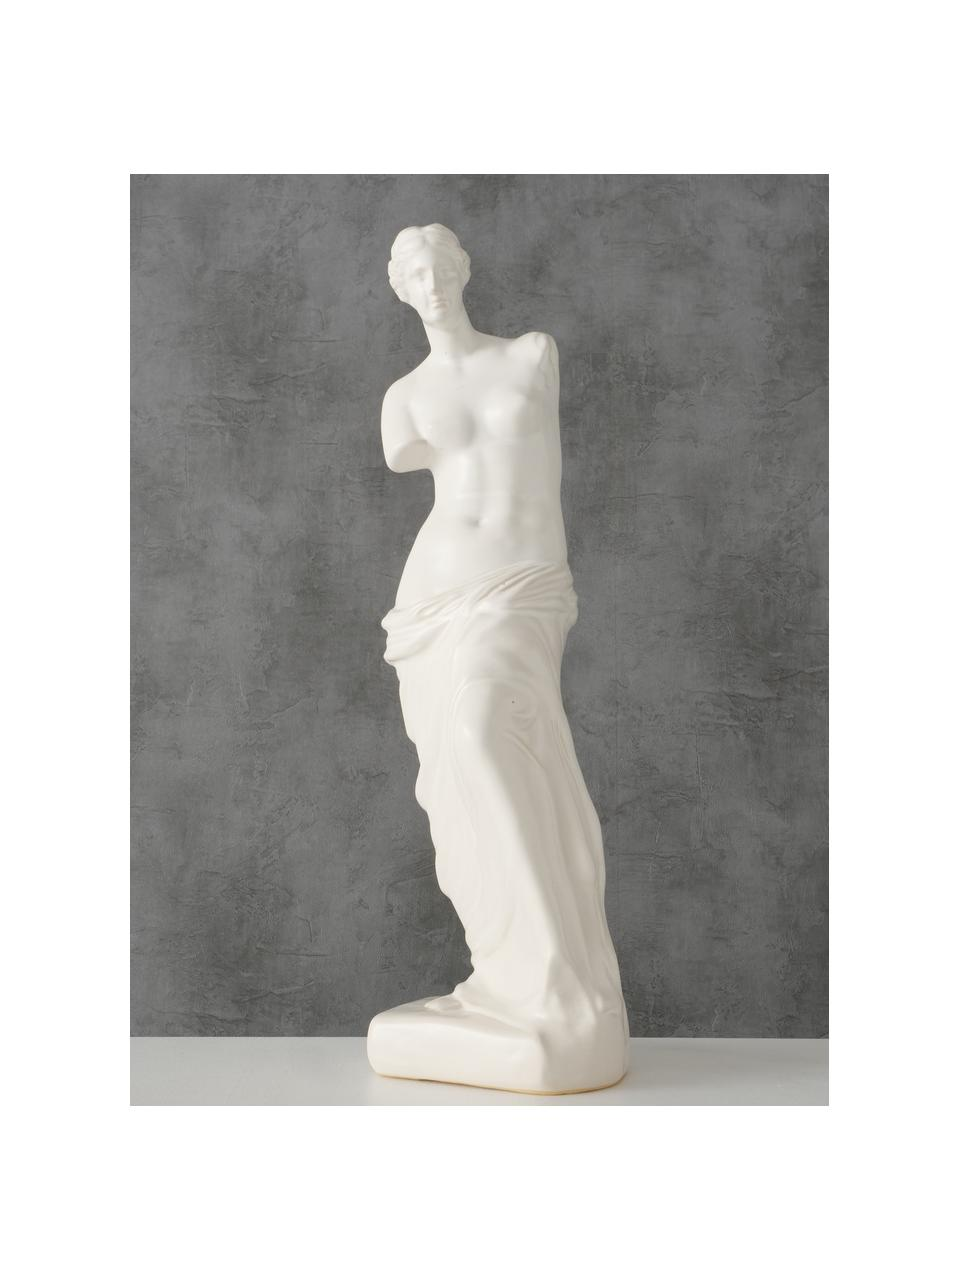 Oggetto decorativo Lorenza, Gres, Bianco, Larg. 12 x Alt. 41 cm